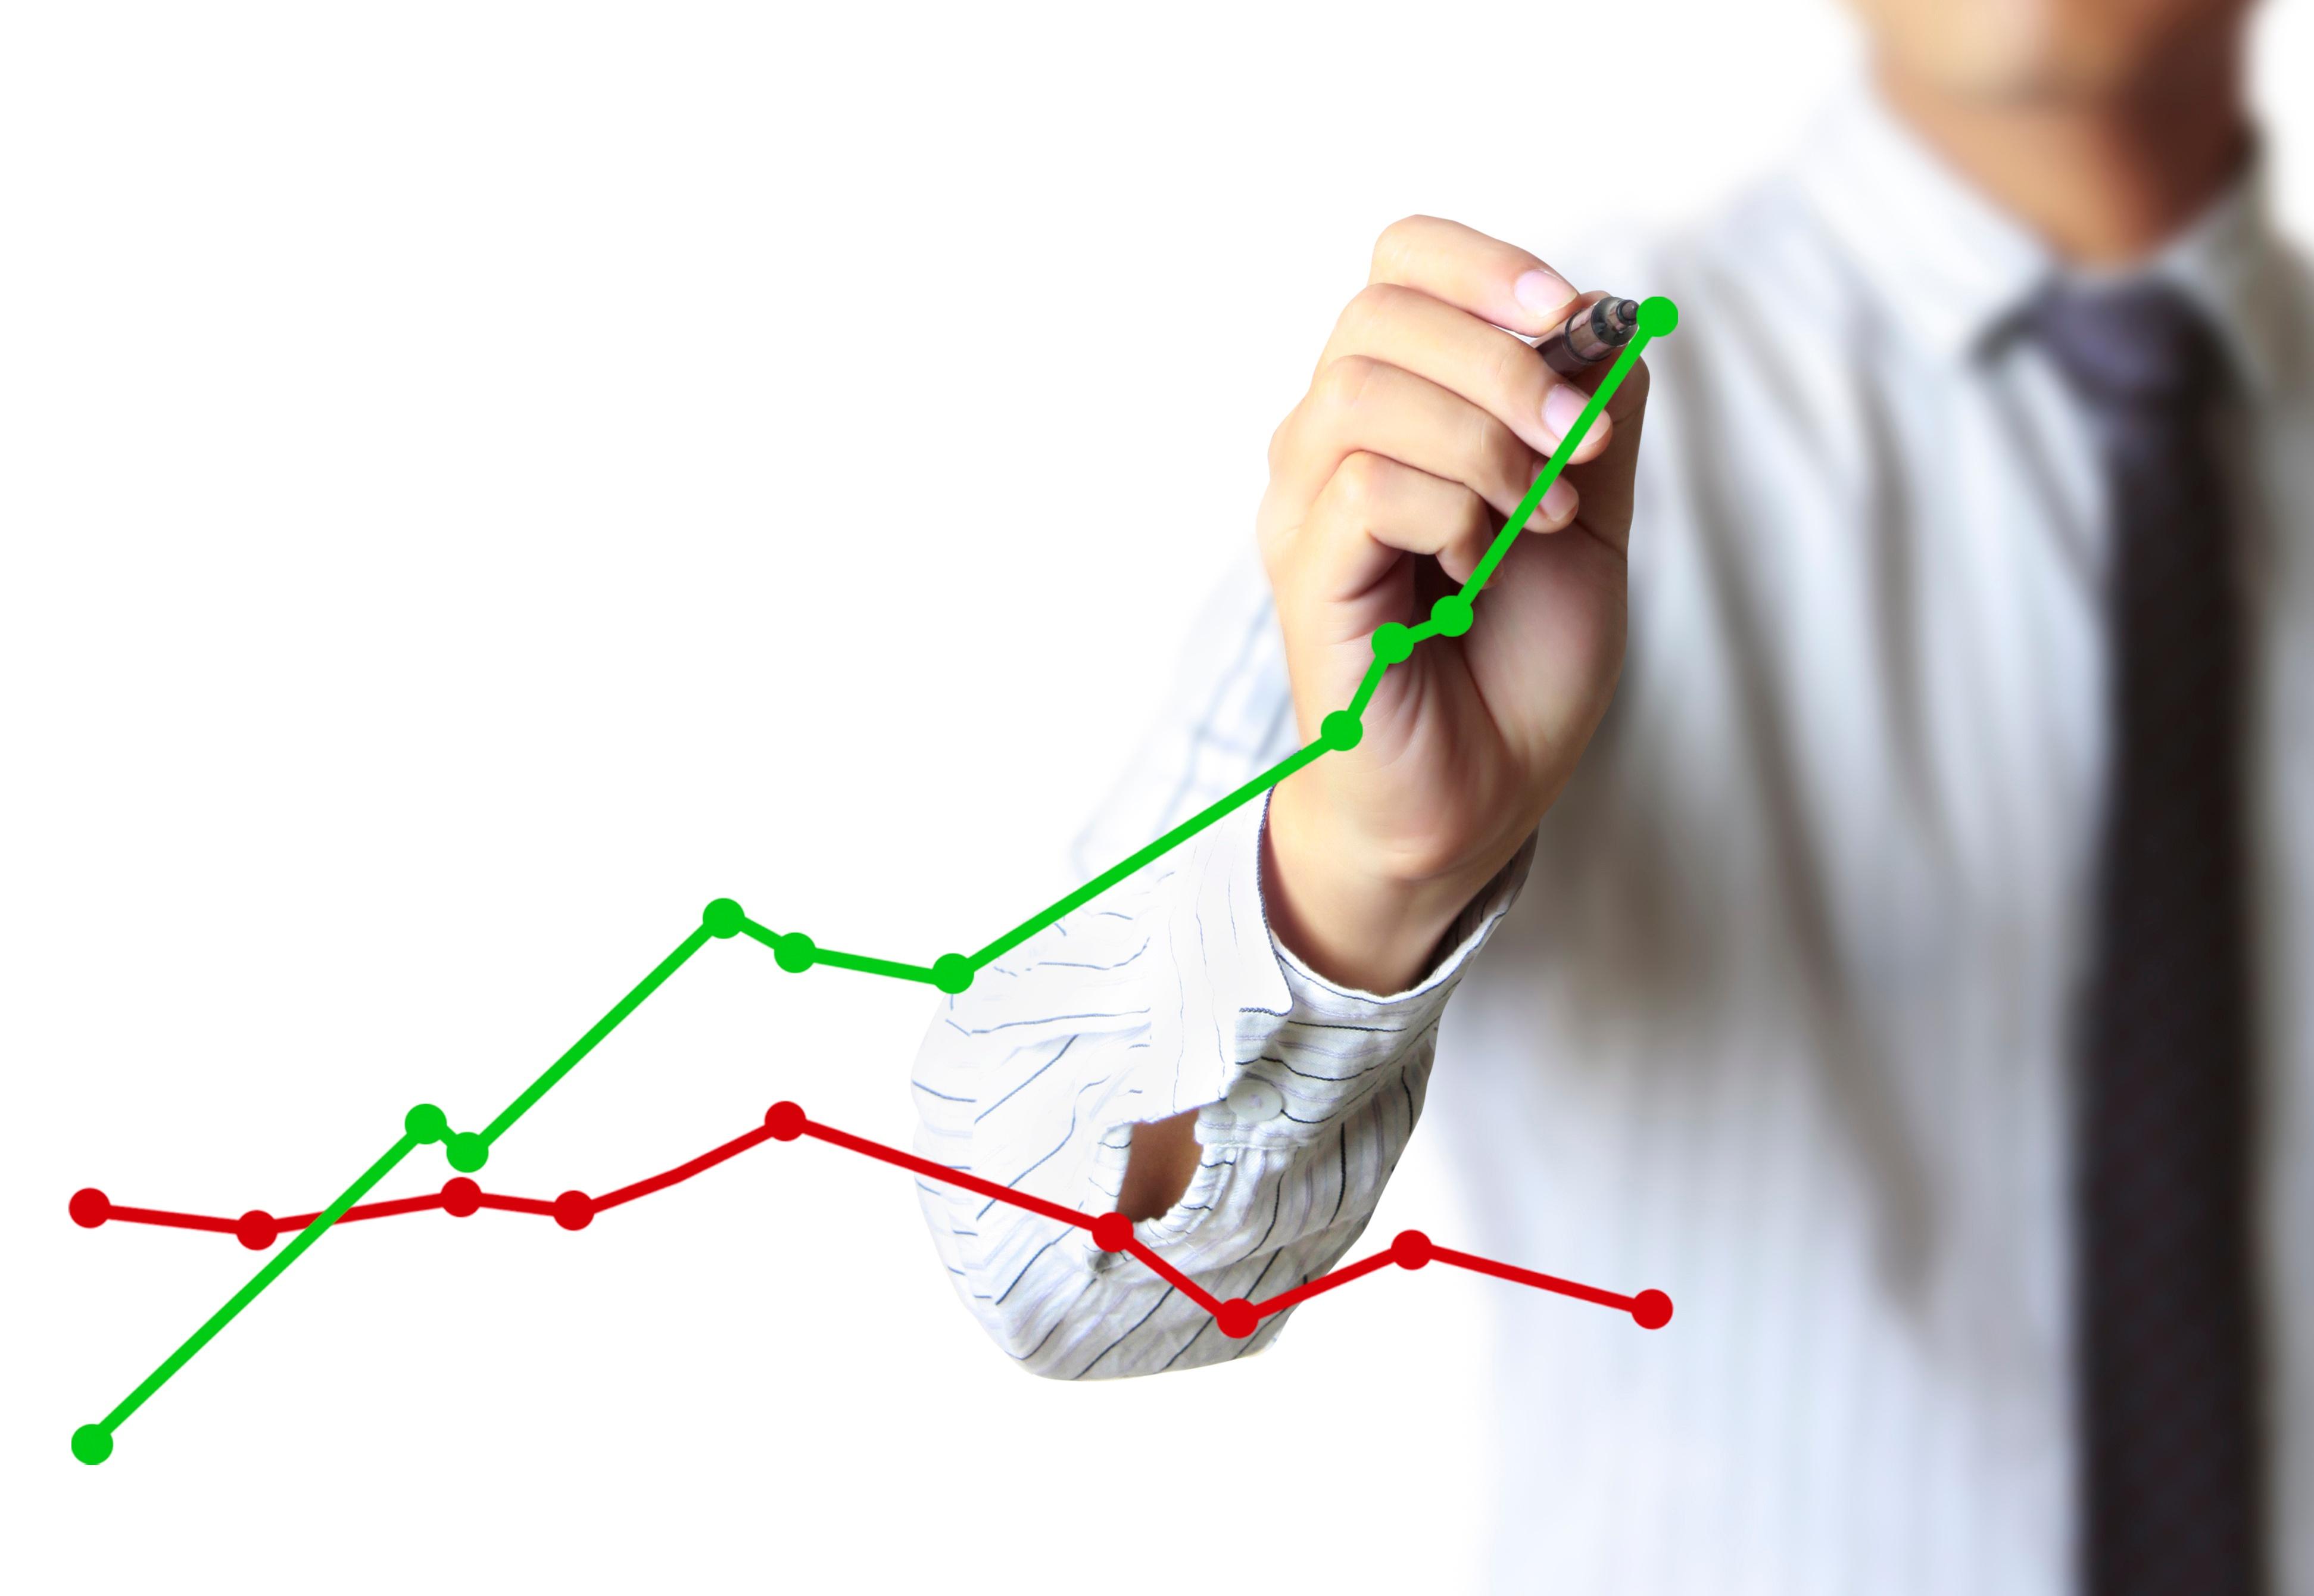 graph iStock_29139588_LARGE-1.jpg